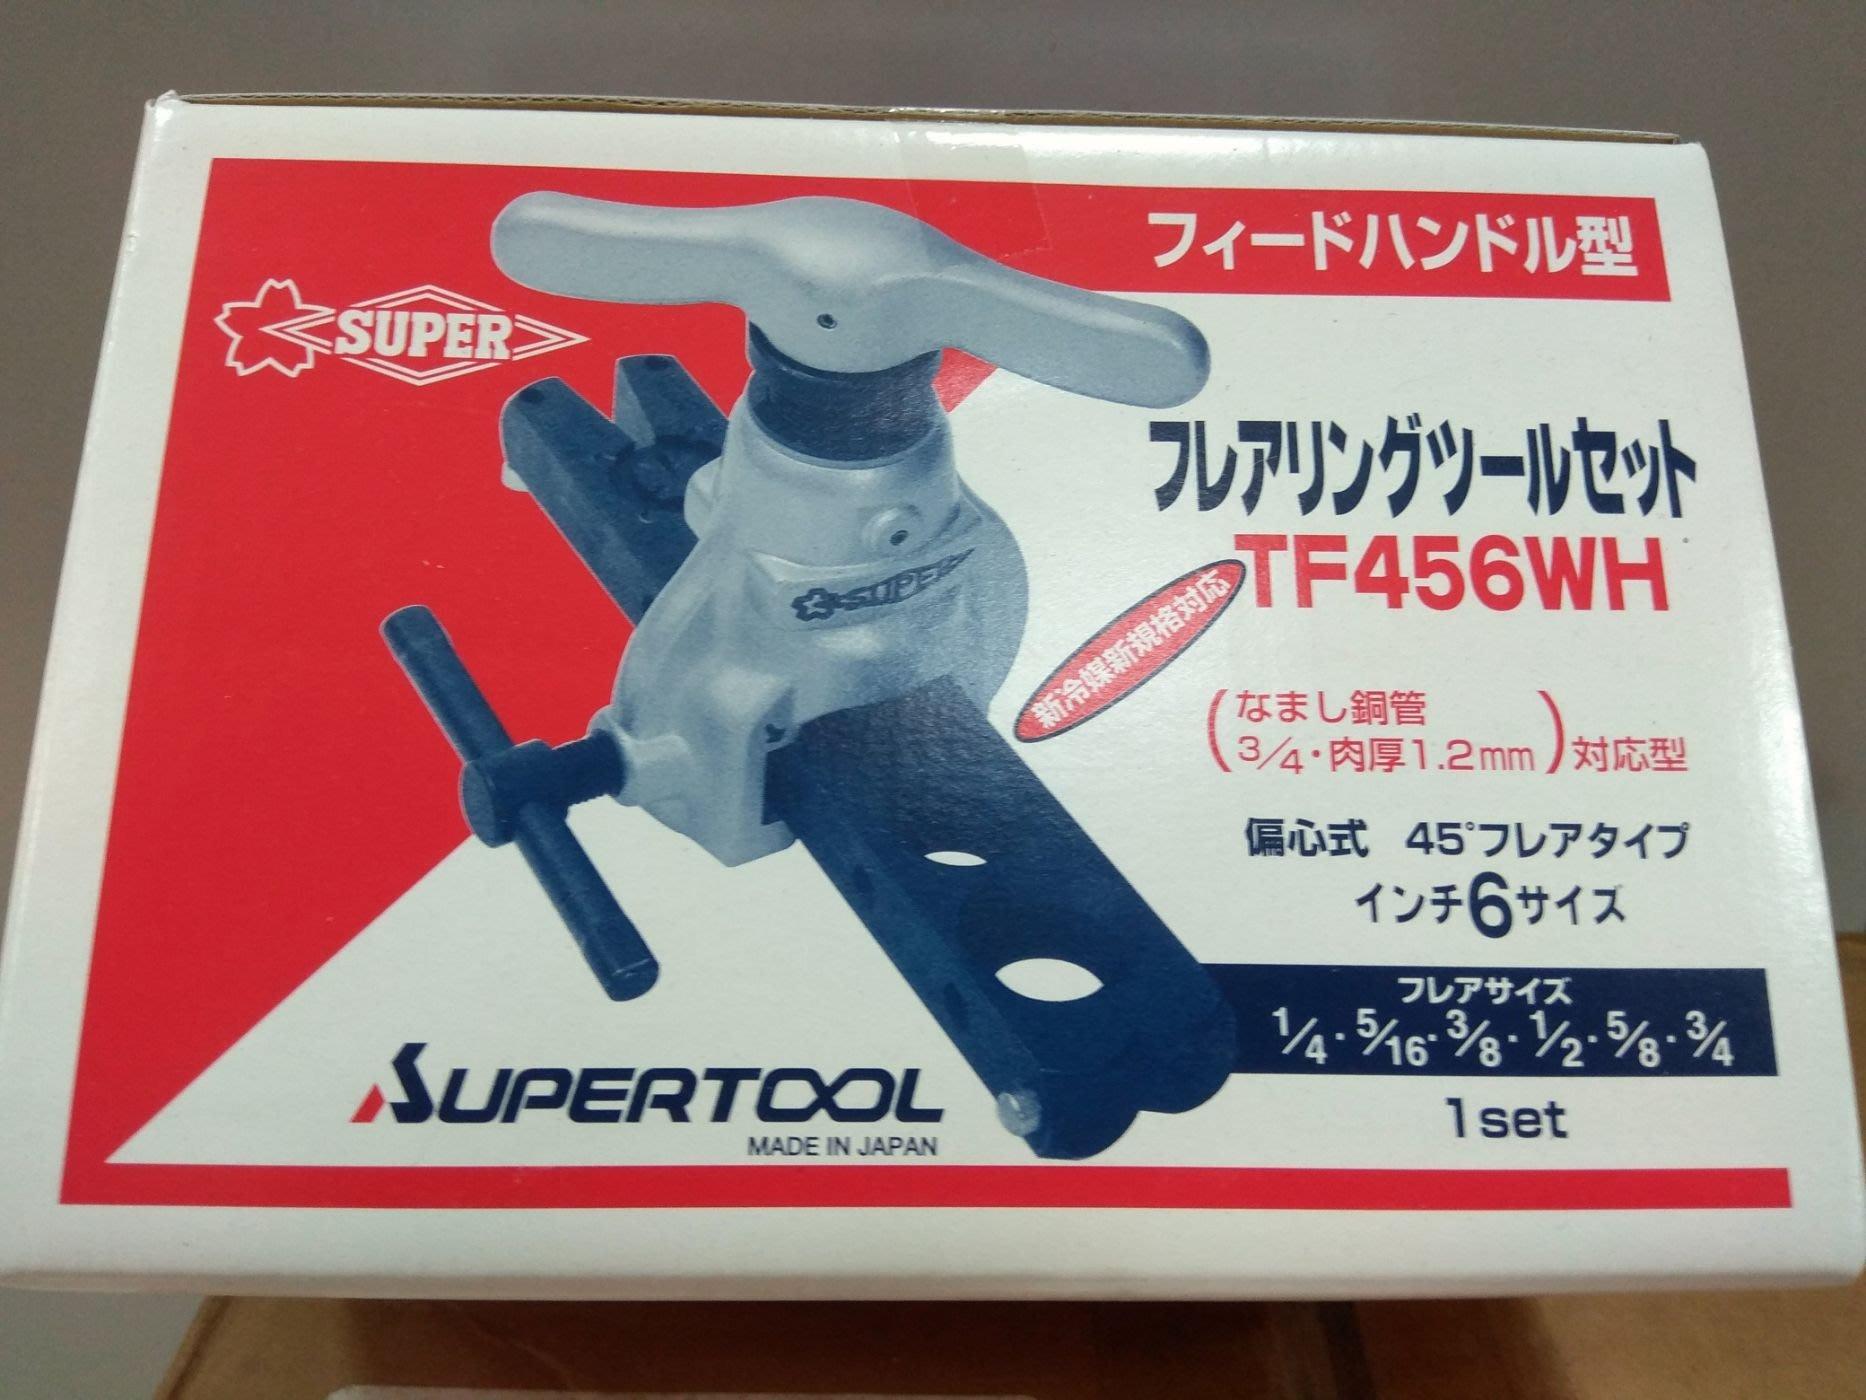 Super 日本製造 擴管工具 擴管器 R410a R32 可用  (TFA456WH) 實體店面 價格含稅開發票 里奇 Ridgid BBK可參考